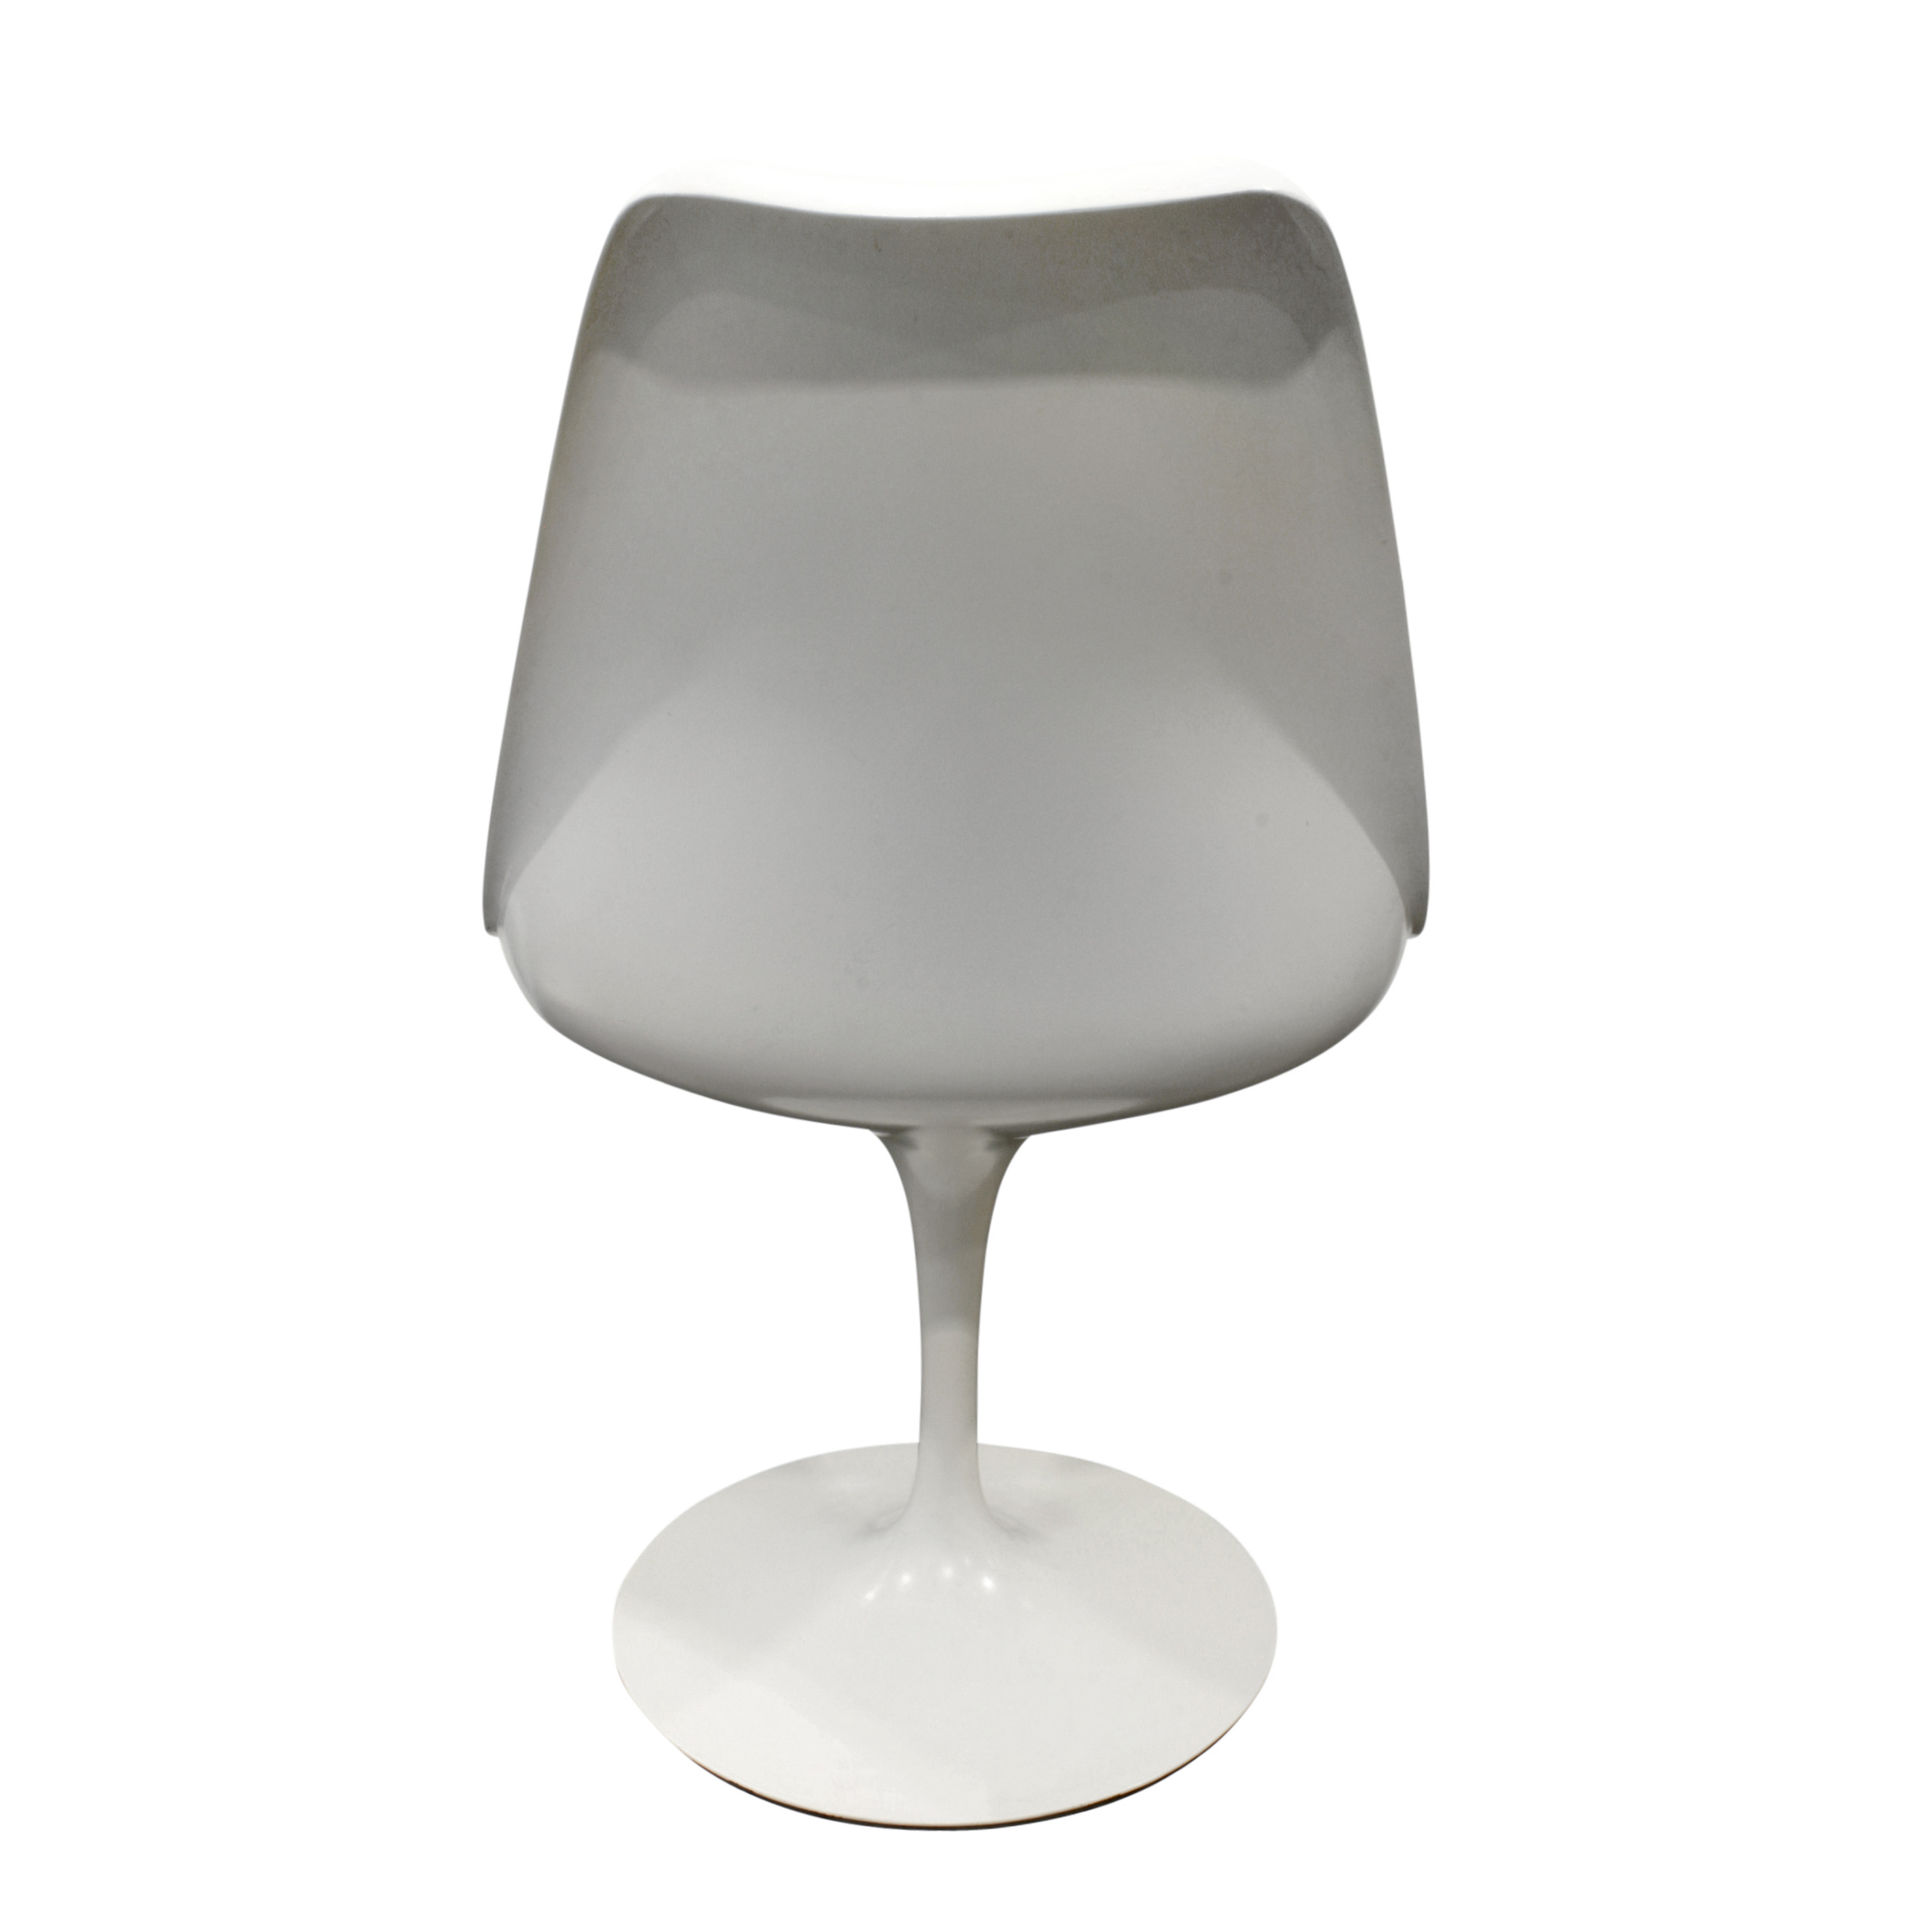 Saarinen 40 Tulip set 4 diningchairs179 bak.jpg